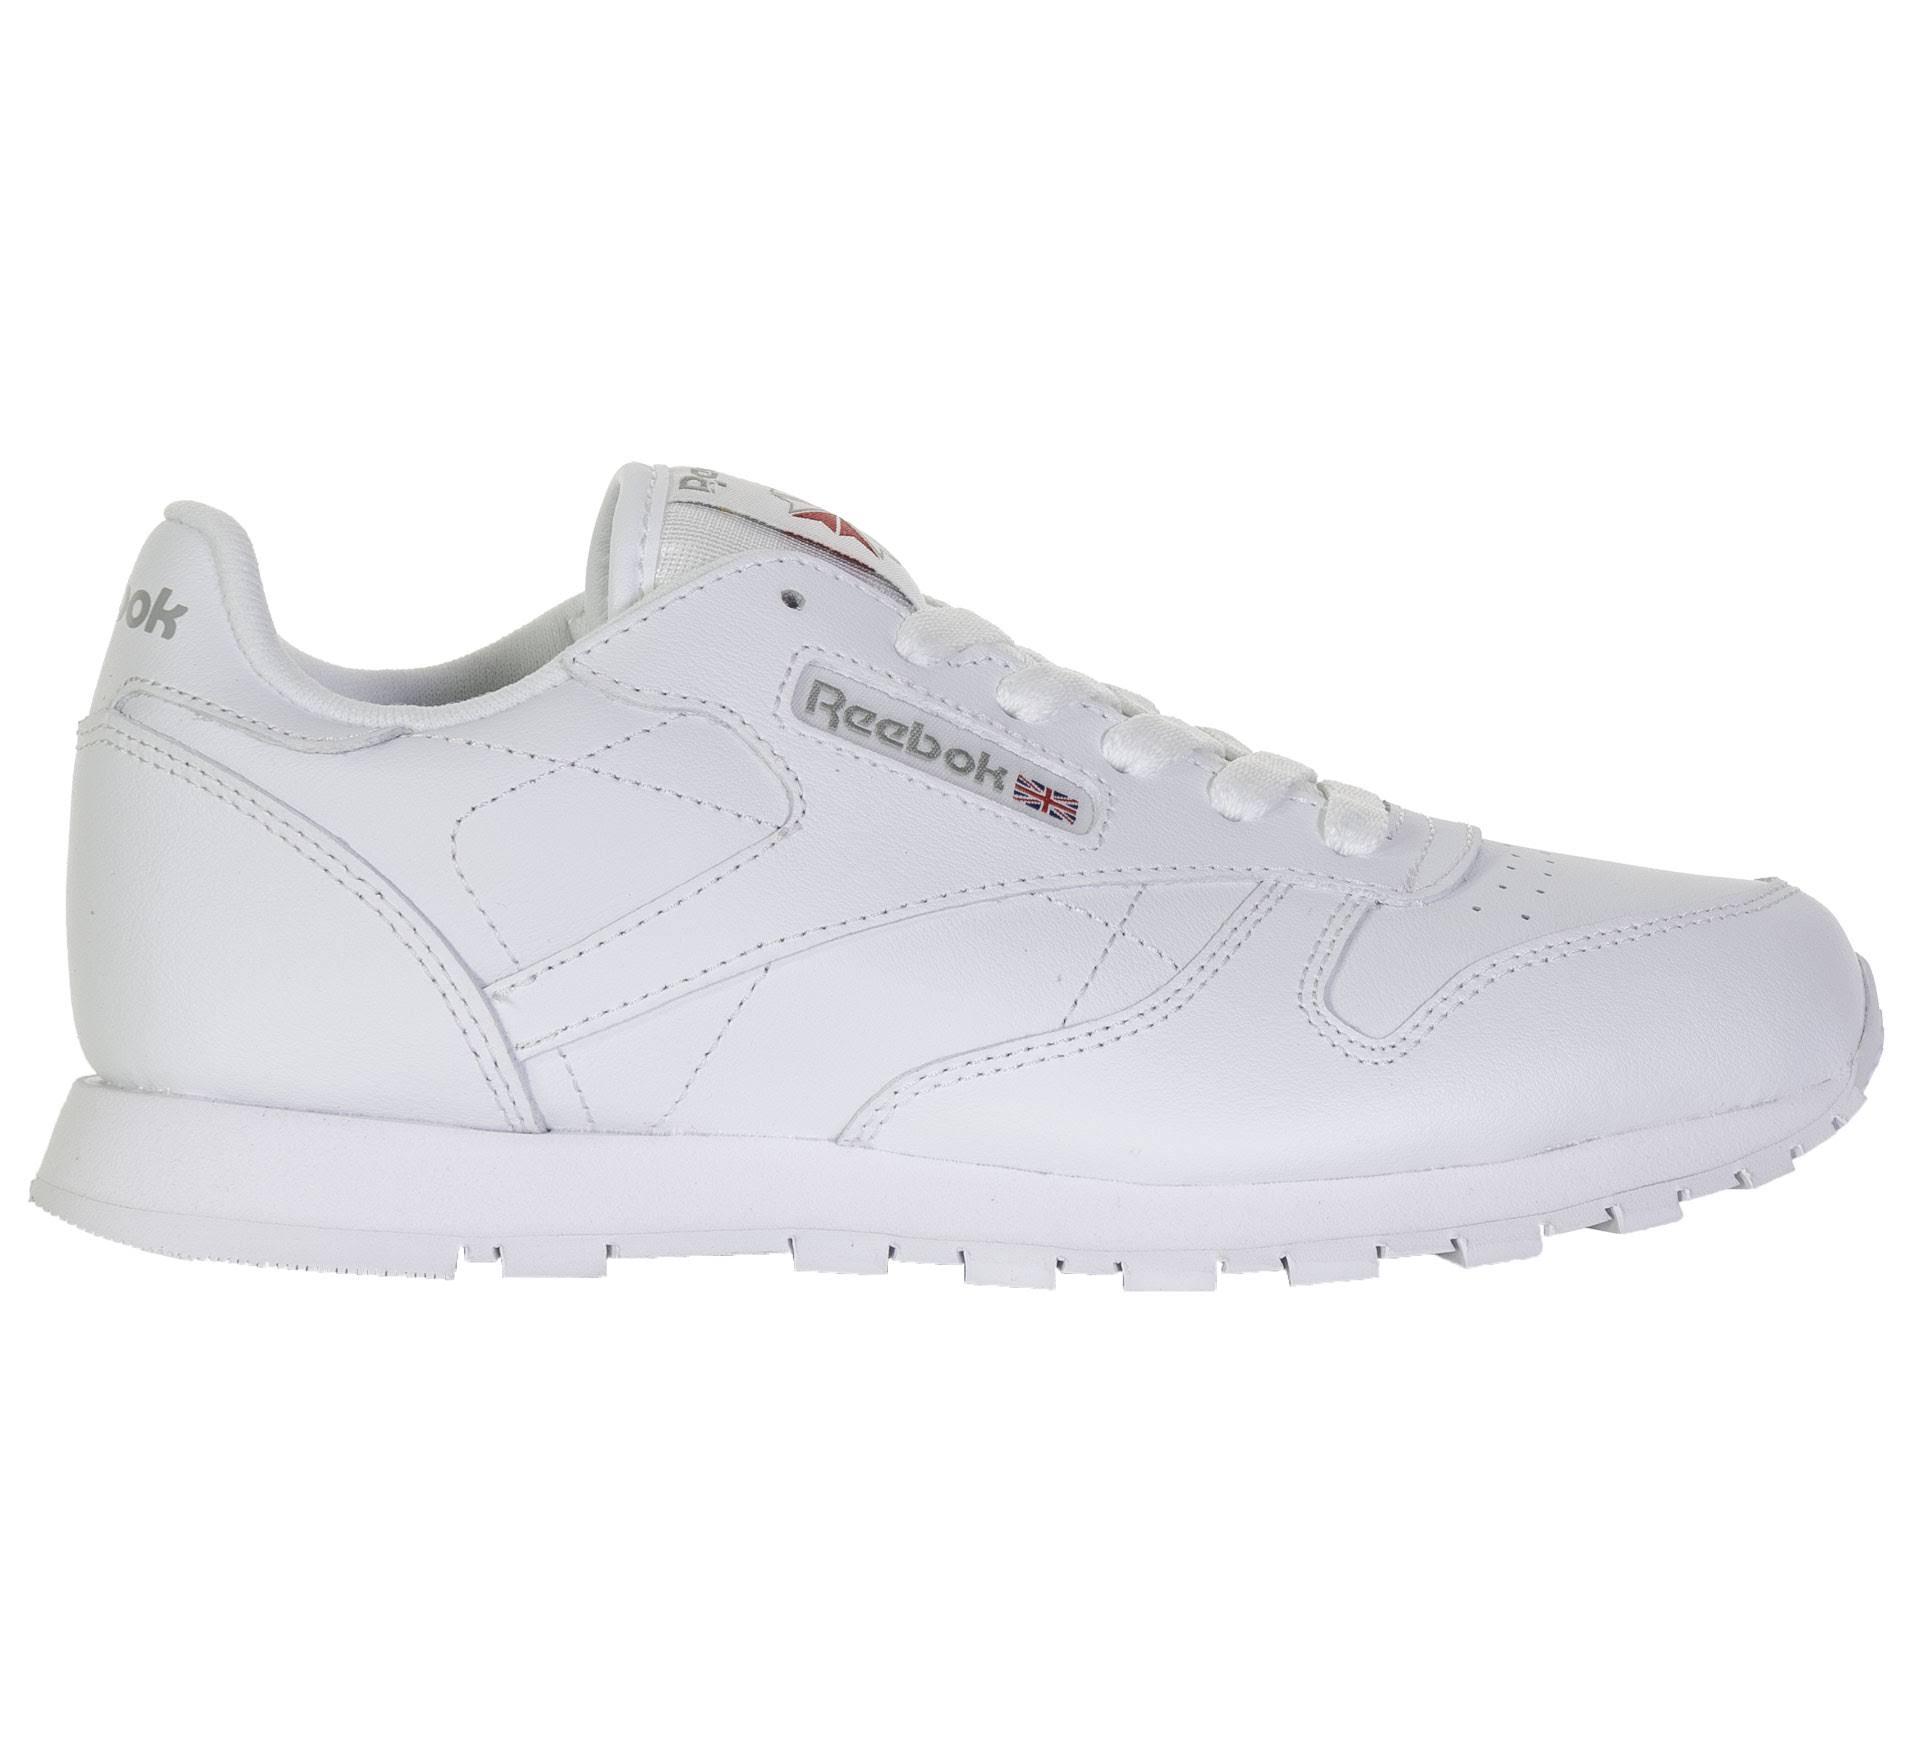 Reebok white Reebok Weiß Classic white Weiß Leather white Reebok Classic Reebok Weiß Leather Classic Classic Leather PfCB0x